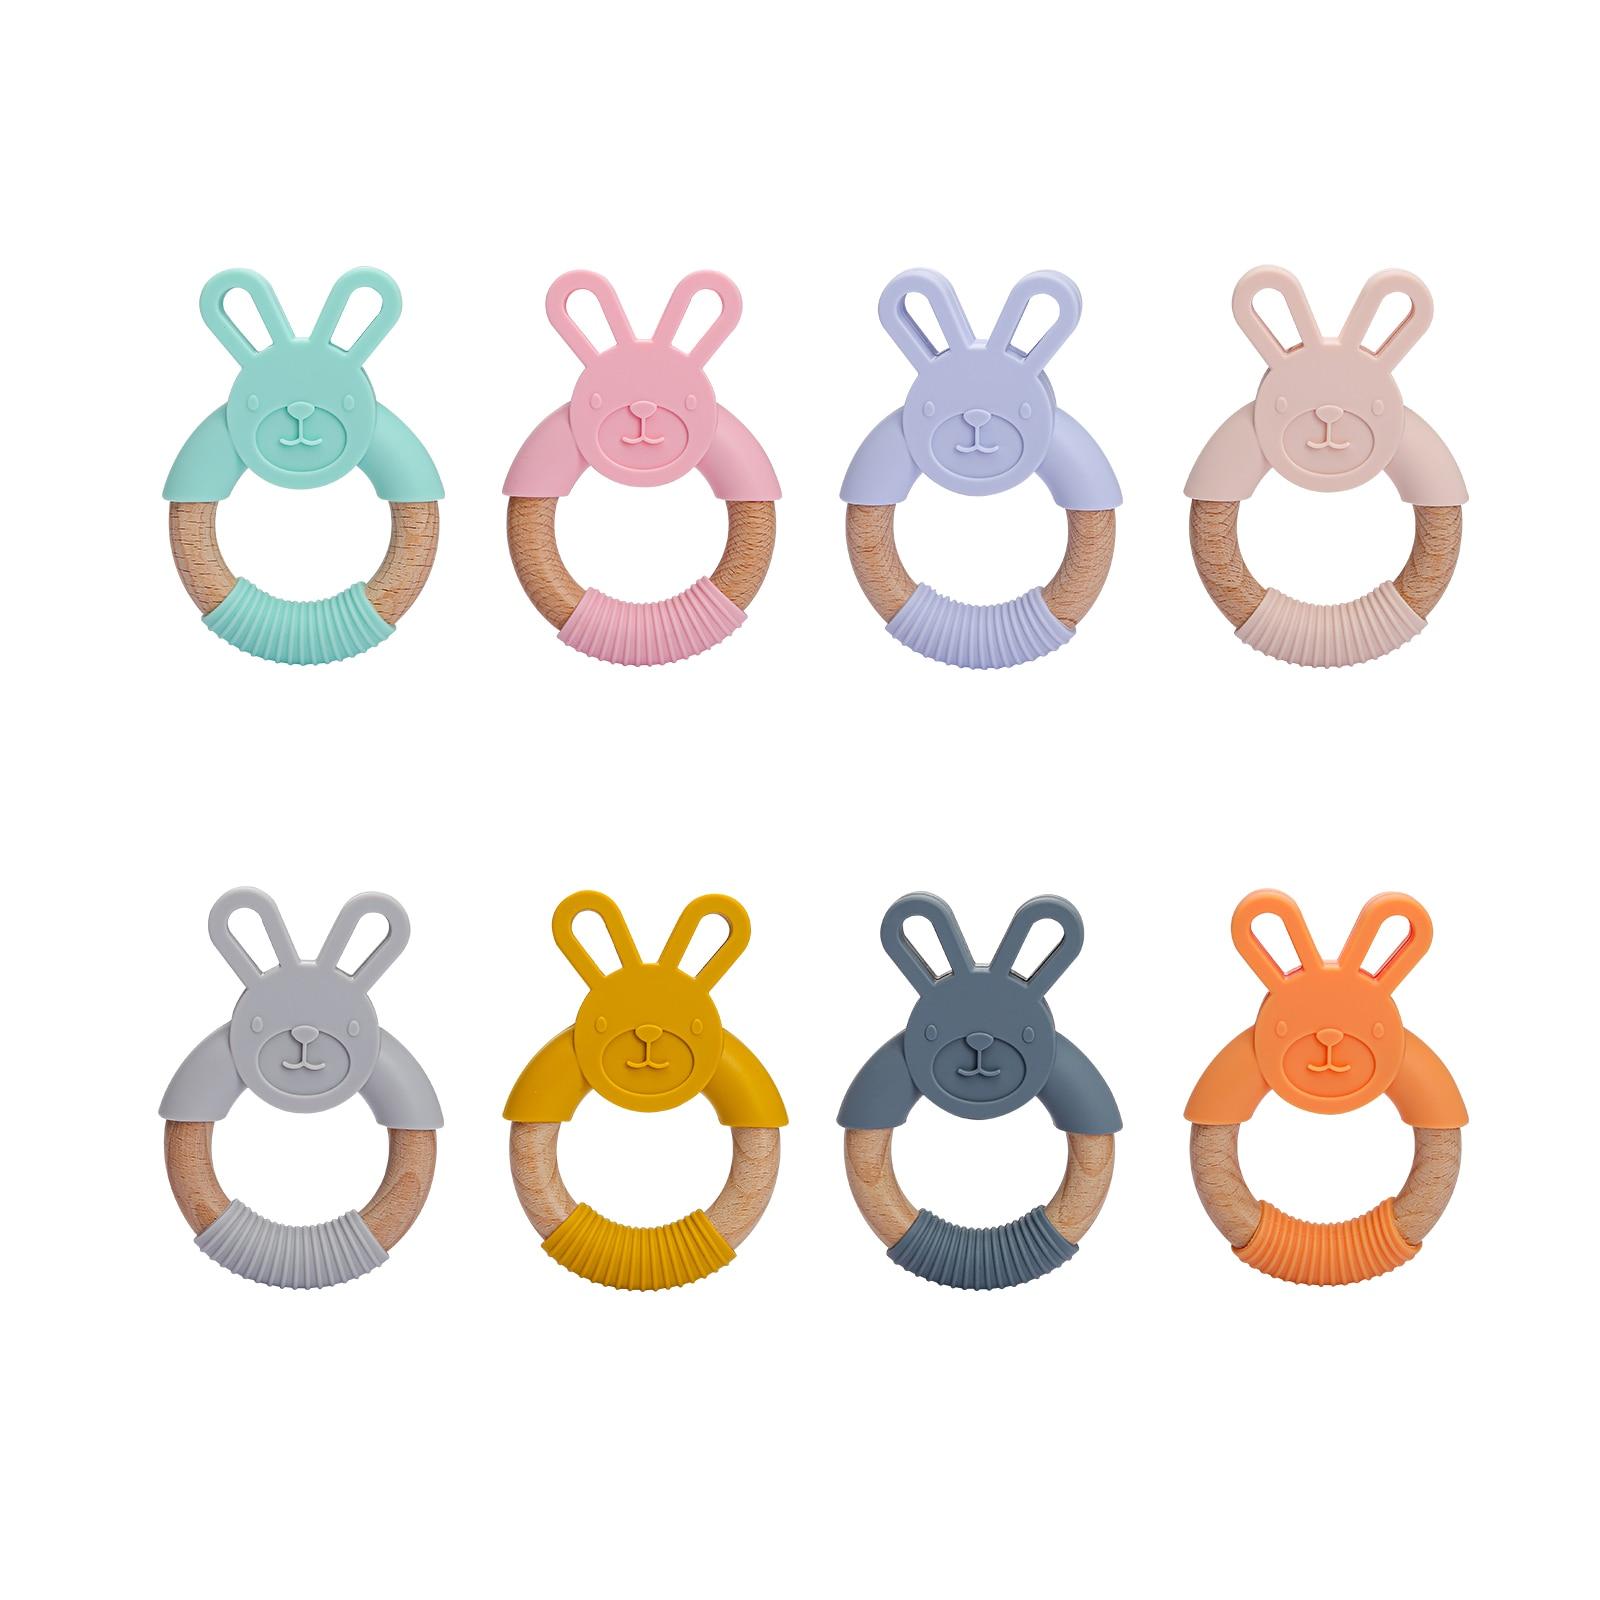 1 Pcs Baby Silicone Teether Cartoon Rabbit Teething Toy Beech Wood Ring Infant Nursing Toys Food Grade BPA Free Baby Teethers